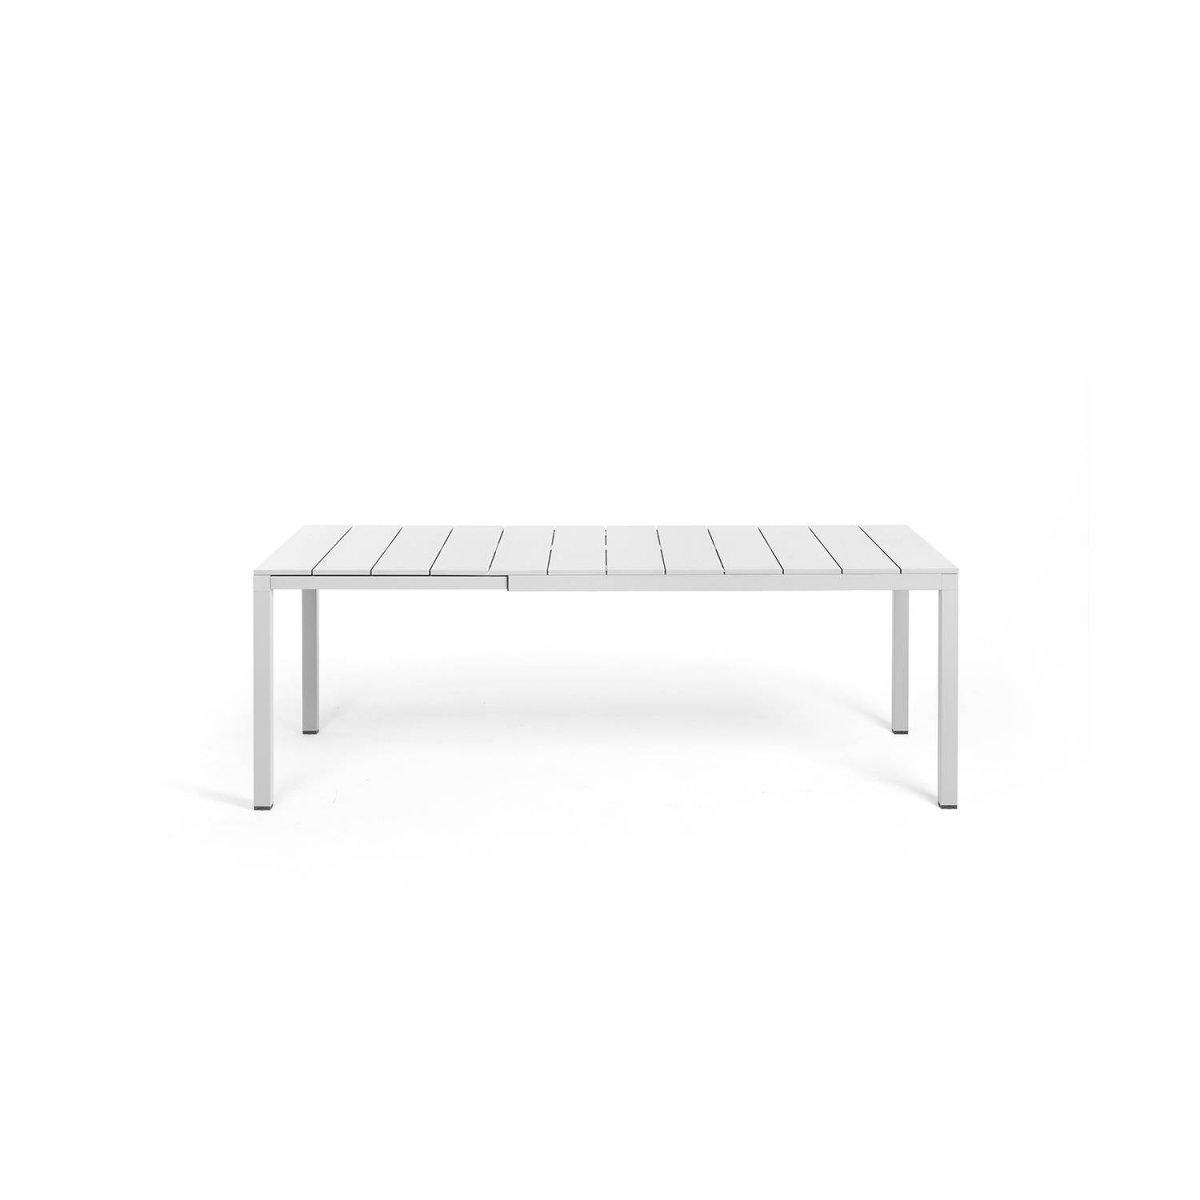 tavolo Rio Alu 140 extensible bianco